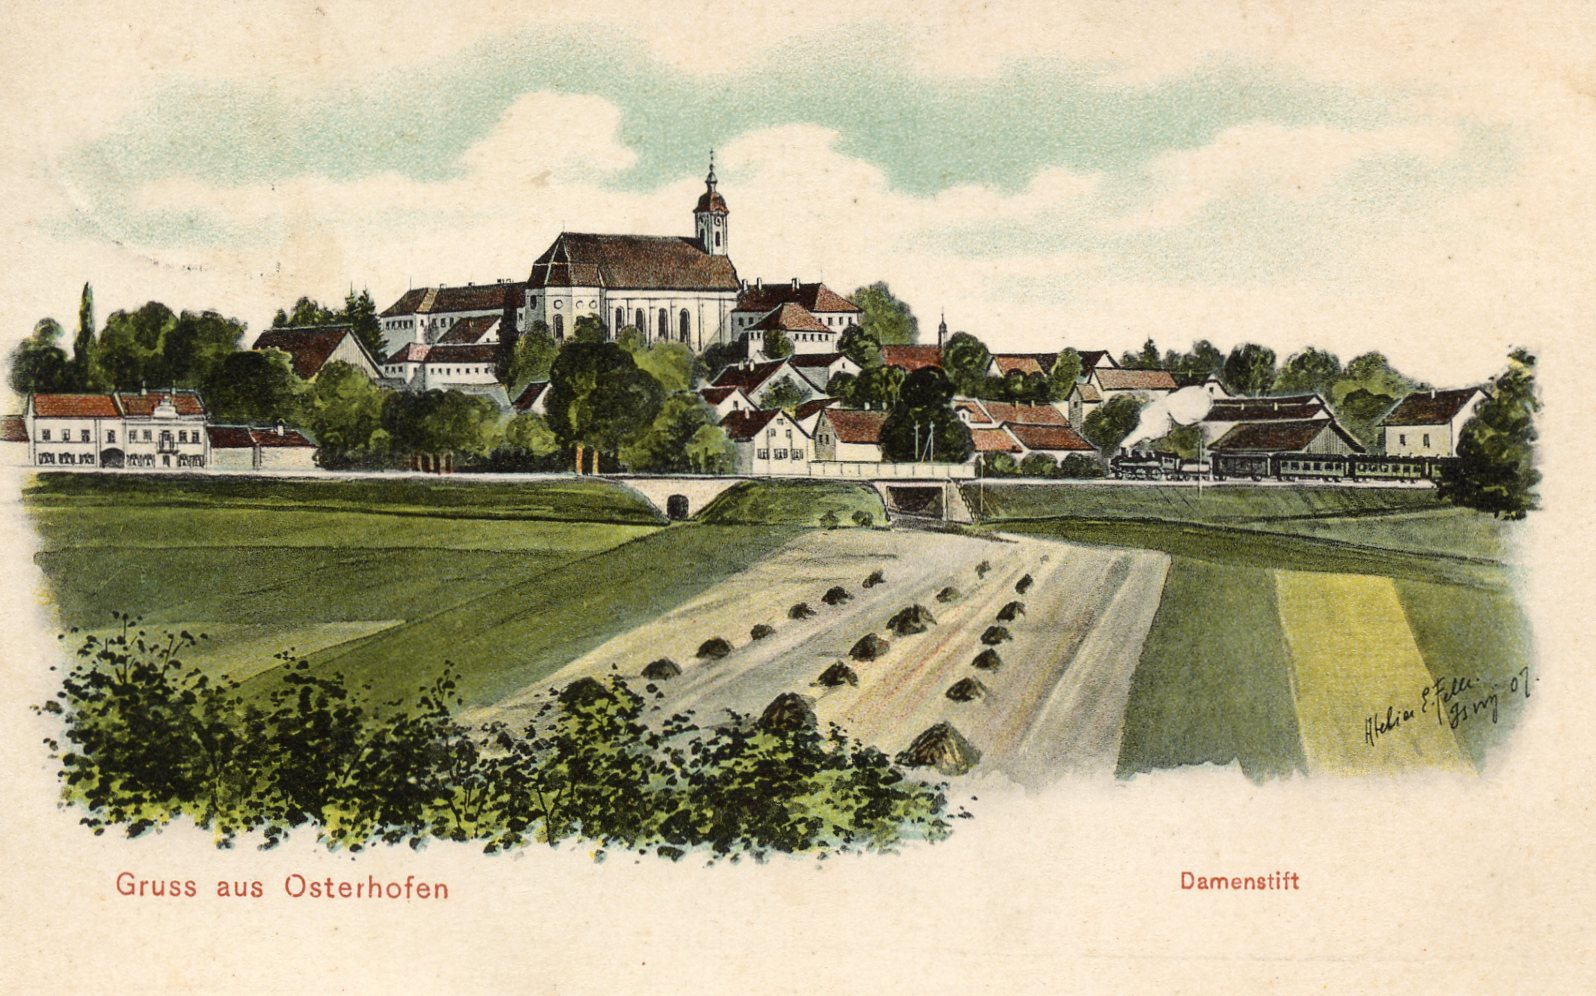 Postkarte aus dem Jahr ca. 1907